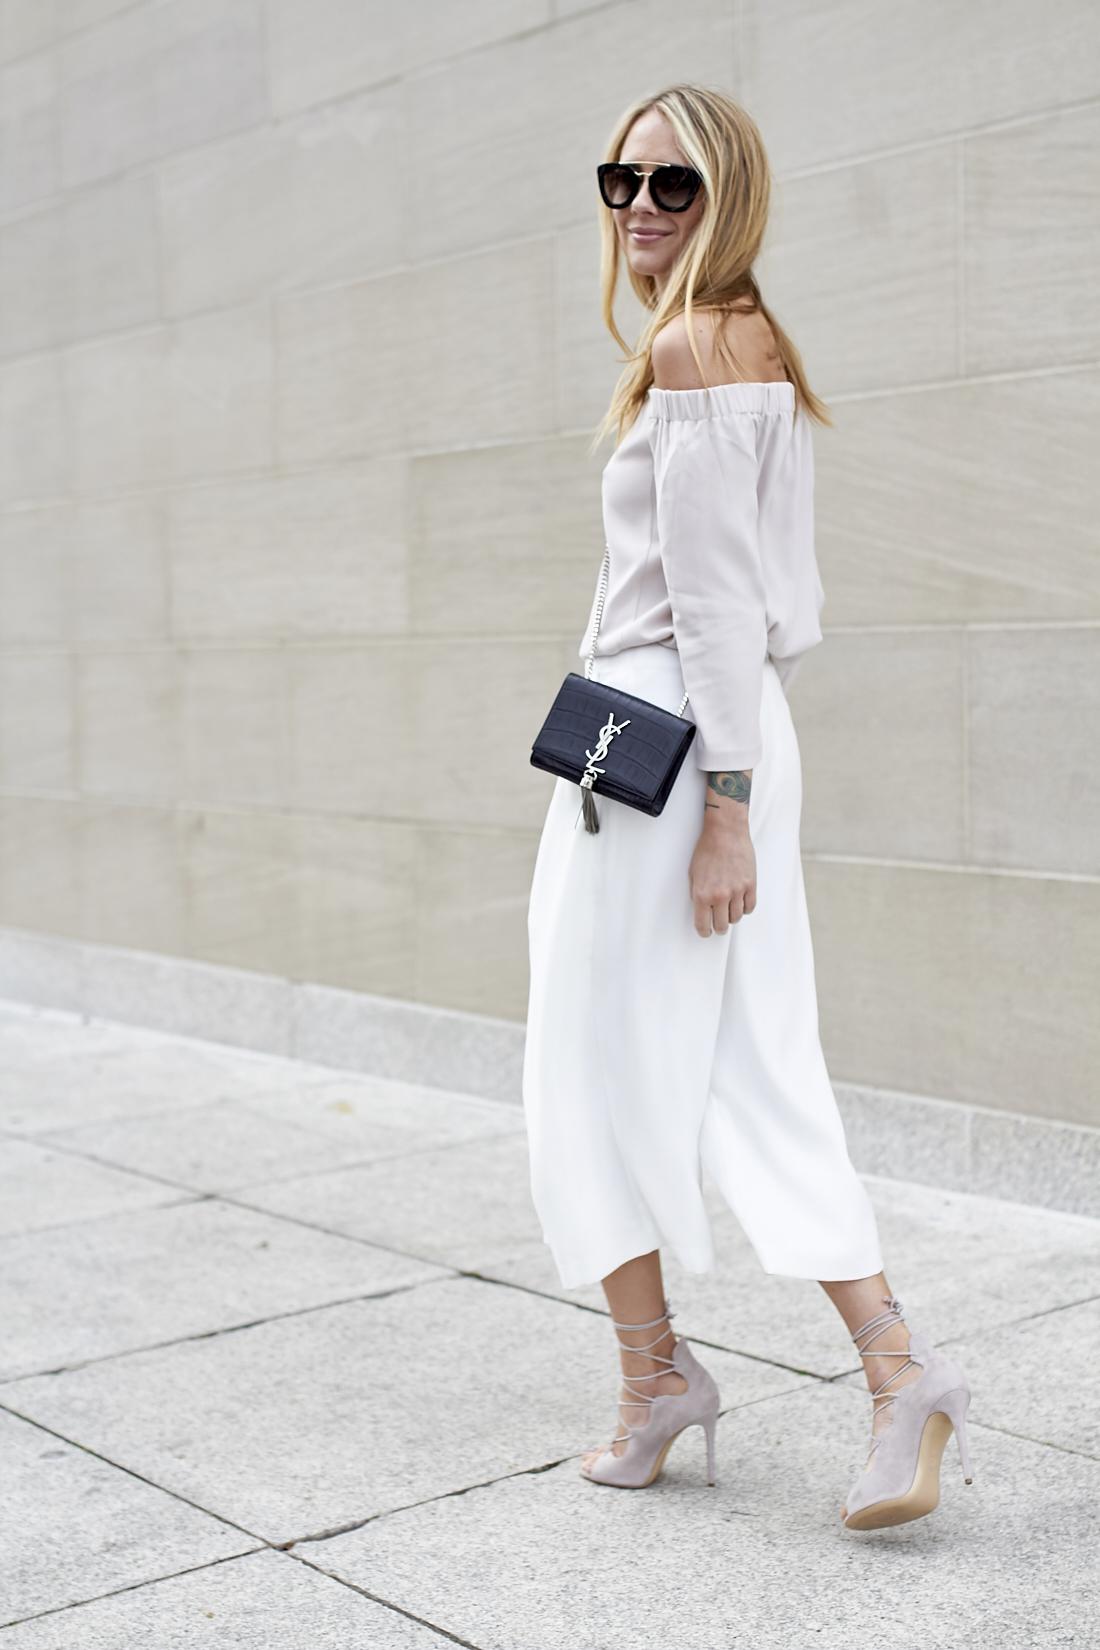 fashion-jackson-prada-retro-sunglasses-off-the-shoulder-top-white-culottes-saint-laurent-monogram-crossbody-mgemi-marea-lace-up-heels